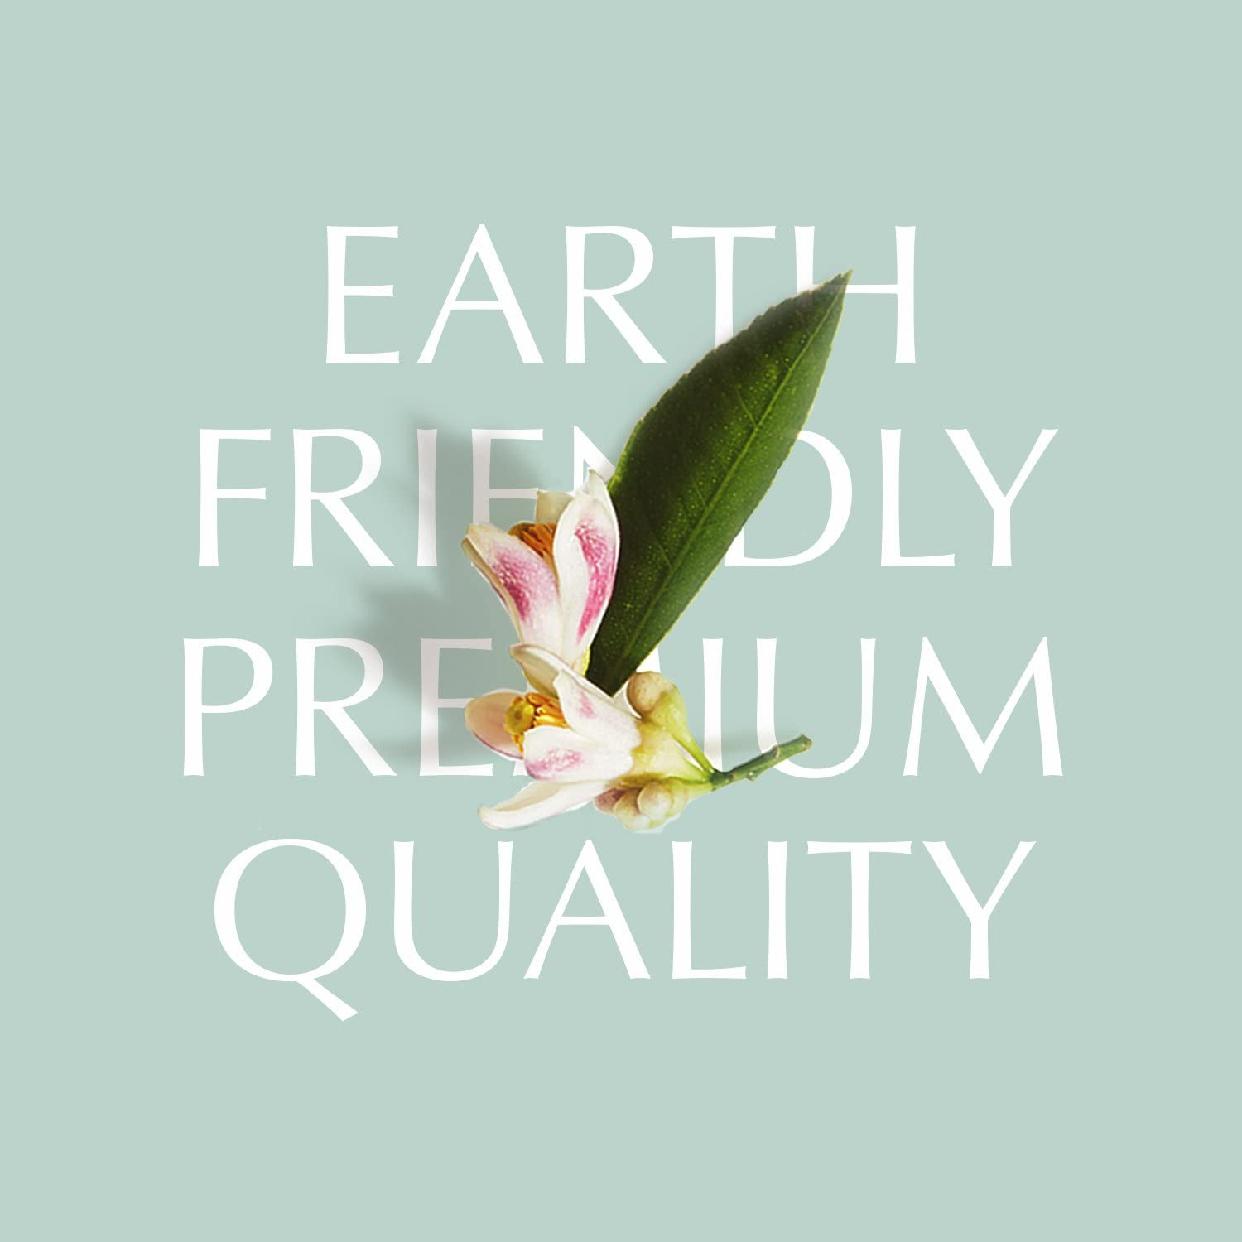 john masters organics(ジョンマスターオーガニック)H&Hヘアシャンプー(ハニー&ハイビスカス)の商品画像7